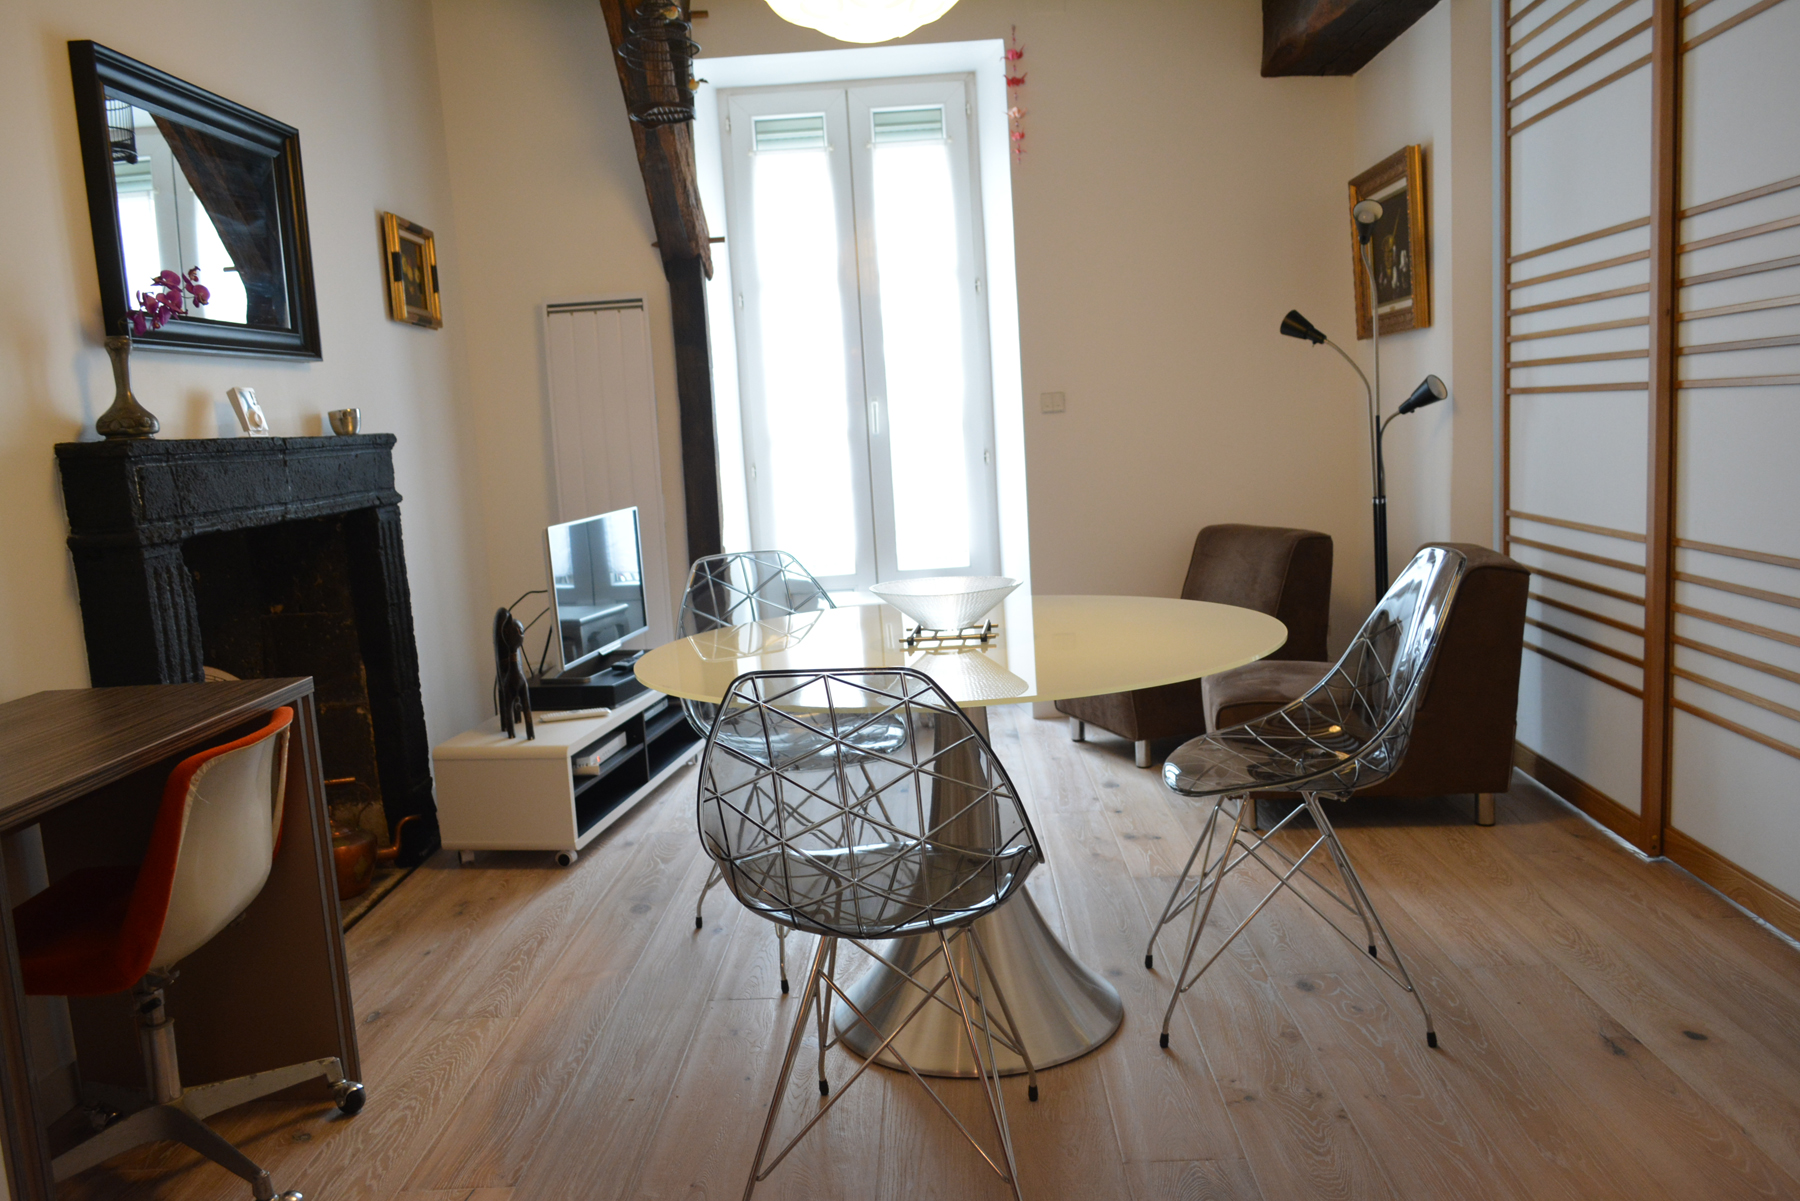 Мебель в однокомнатной квартире модерн